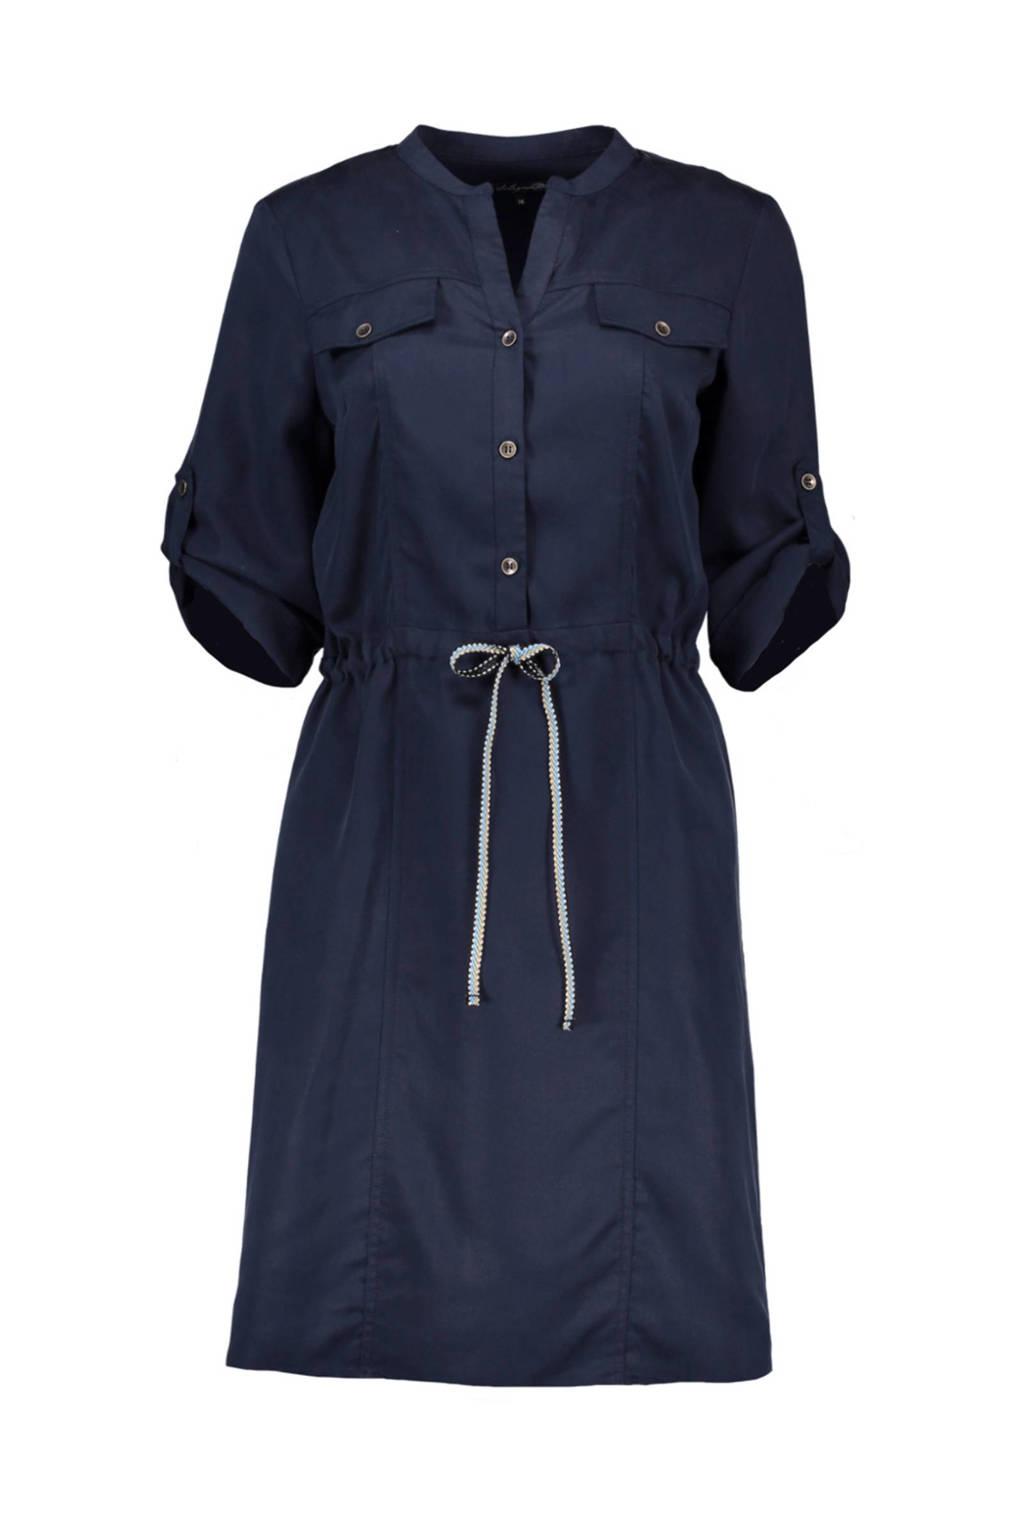 La Ligna blousejurk, Donkerblauw